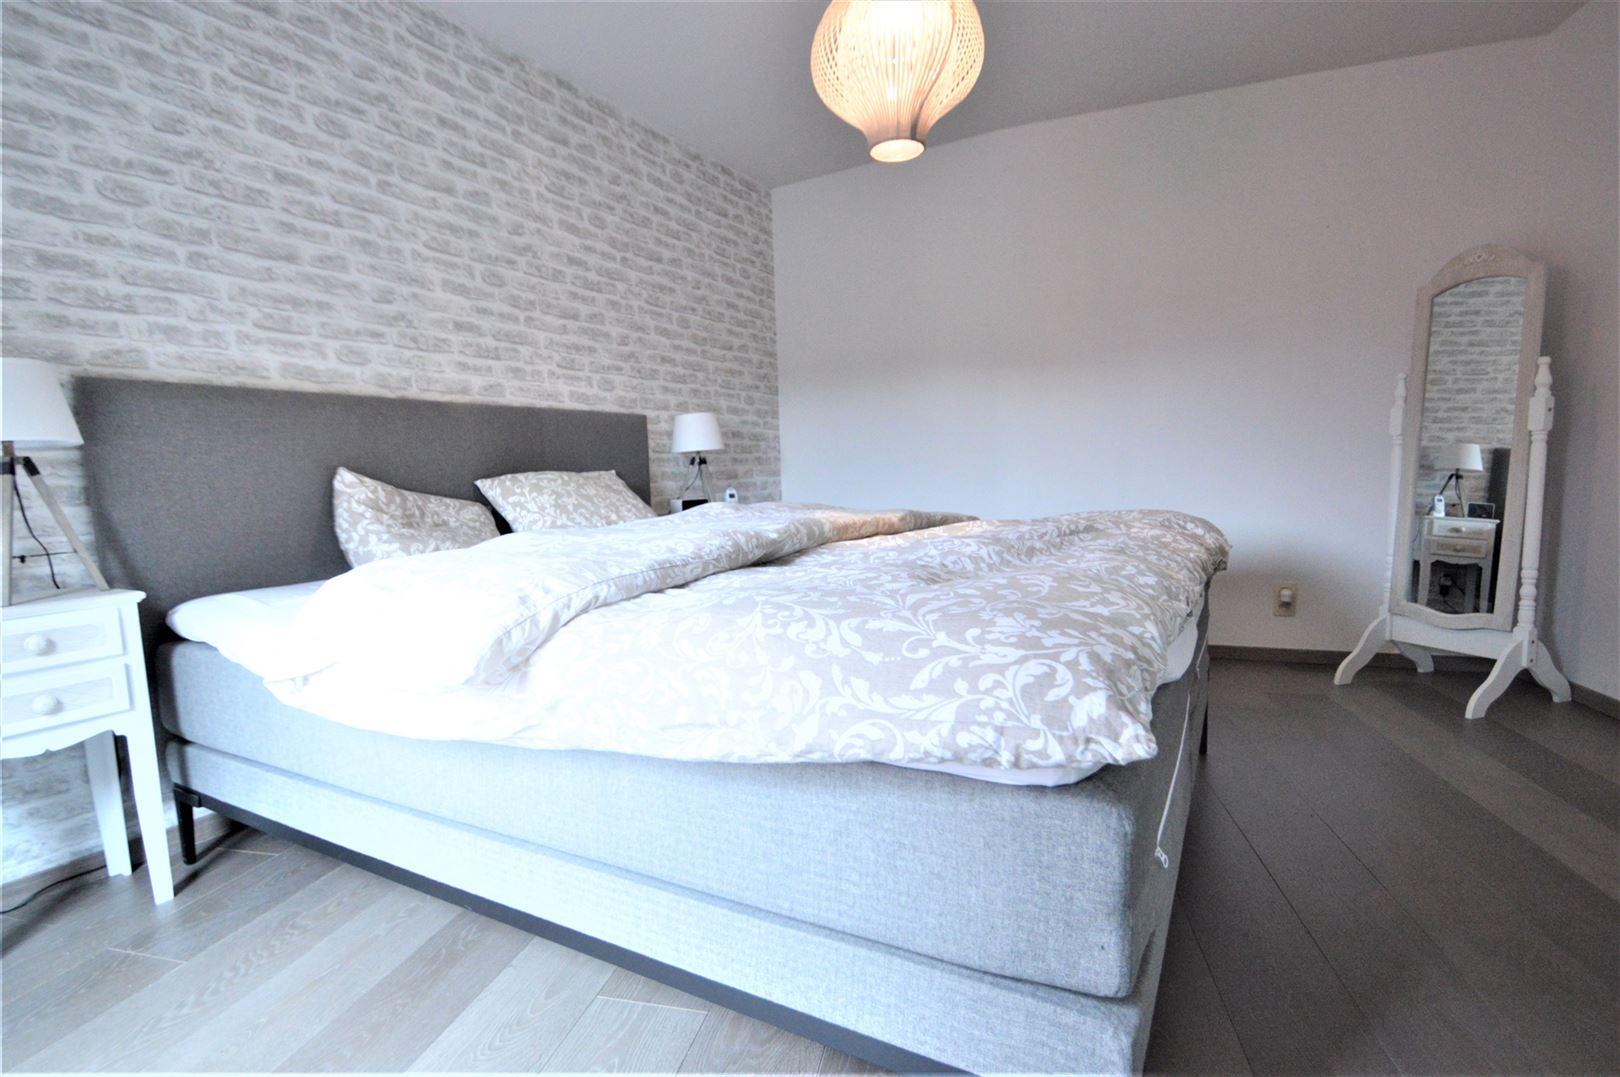 Foto 7 : Appartement te 9200 BAASRODE (België) - Prijs € 750